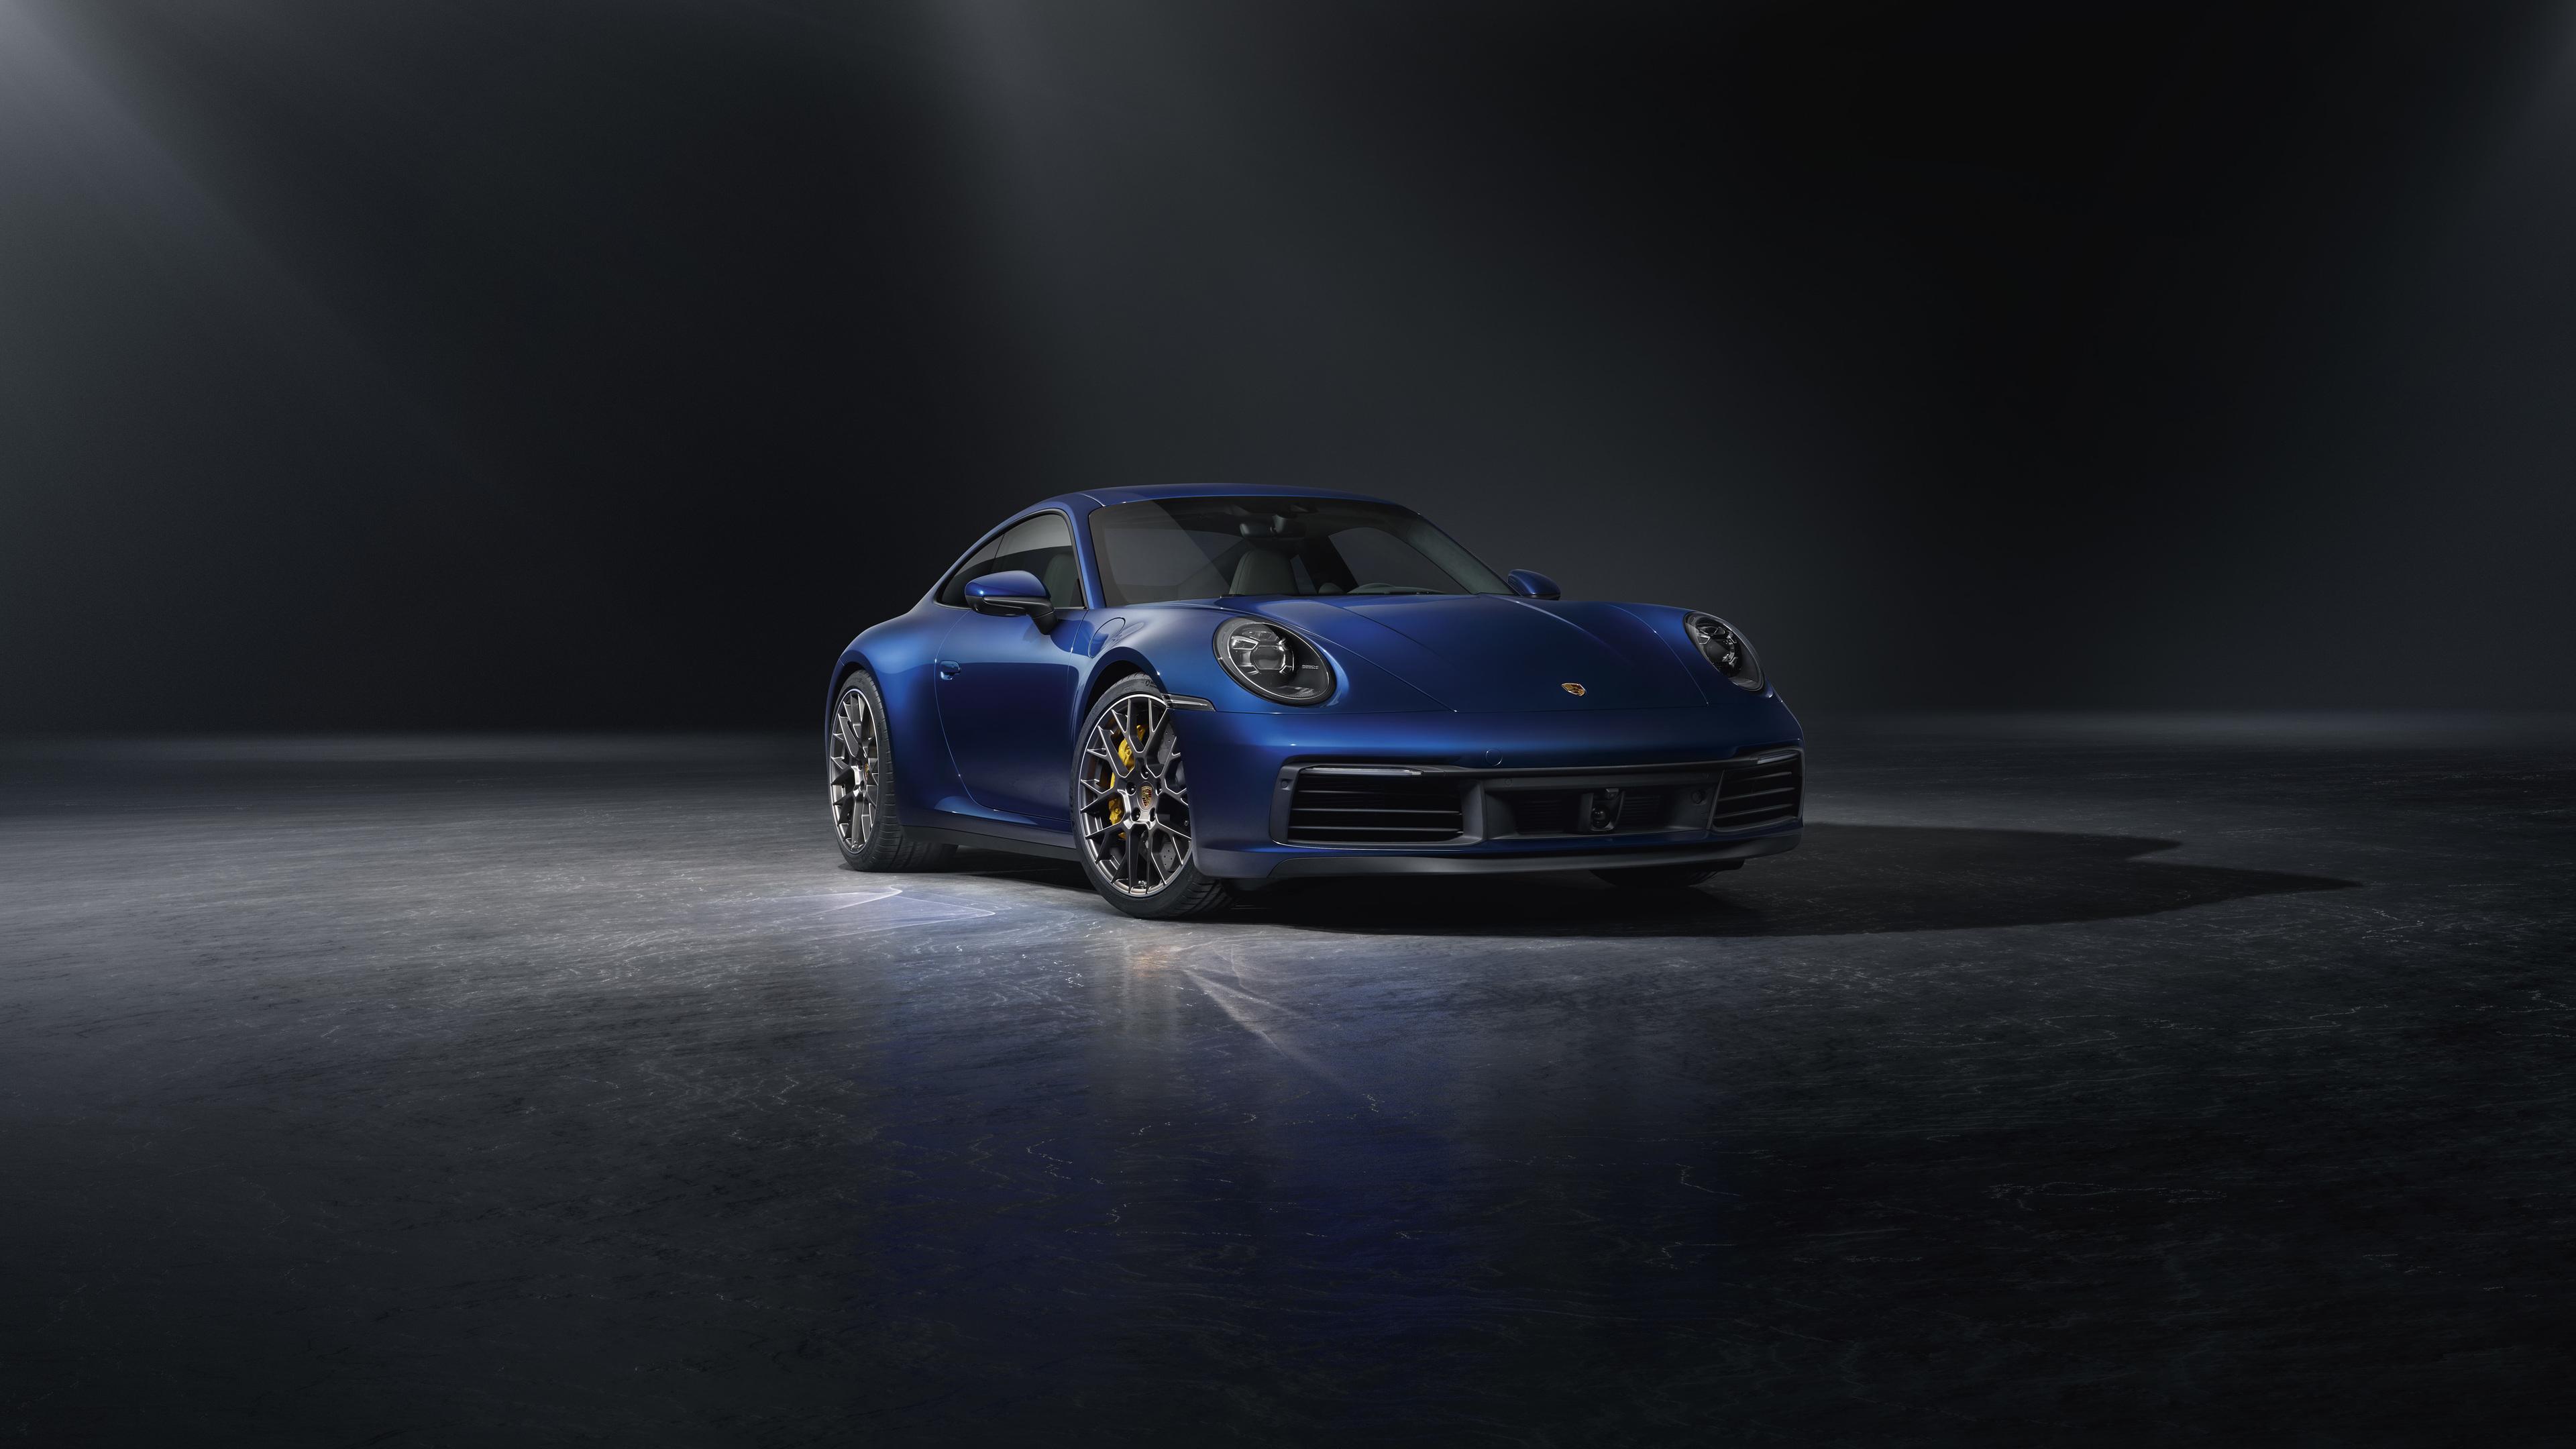 blue porsche 911 2018 front 4k 1546362104 - Blue Porsche 911 2018 Front 4k - porsche wallpapers, porsche 911 wallpapers, hd-wallpapers, cars wallpapers, 5k wallpapers, 4k-wallpapers